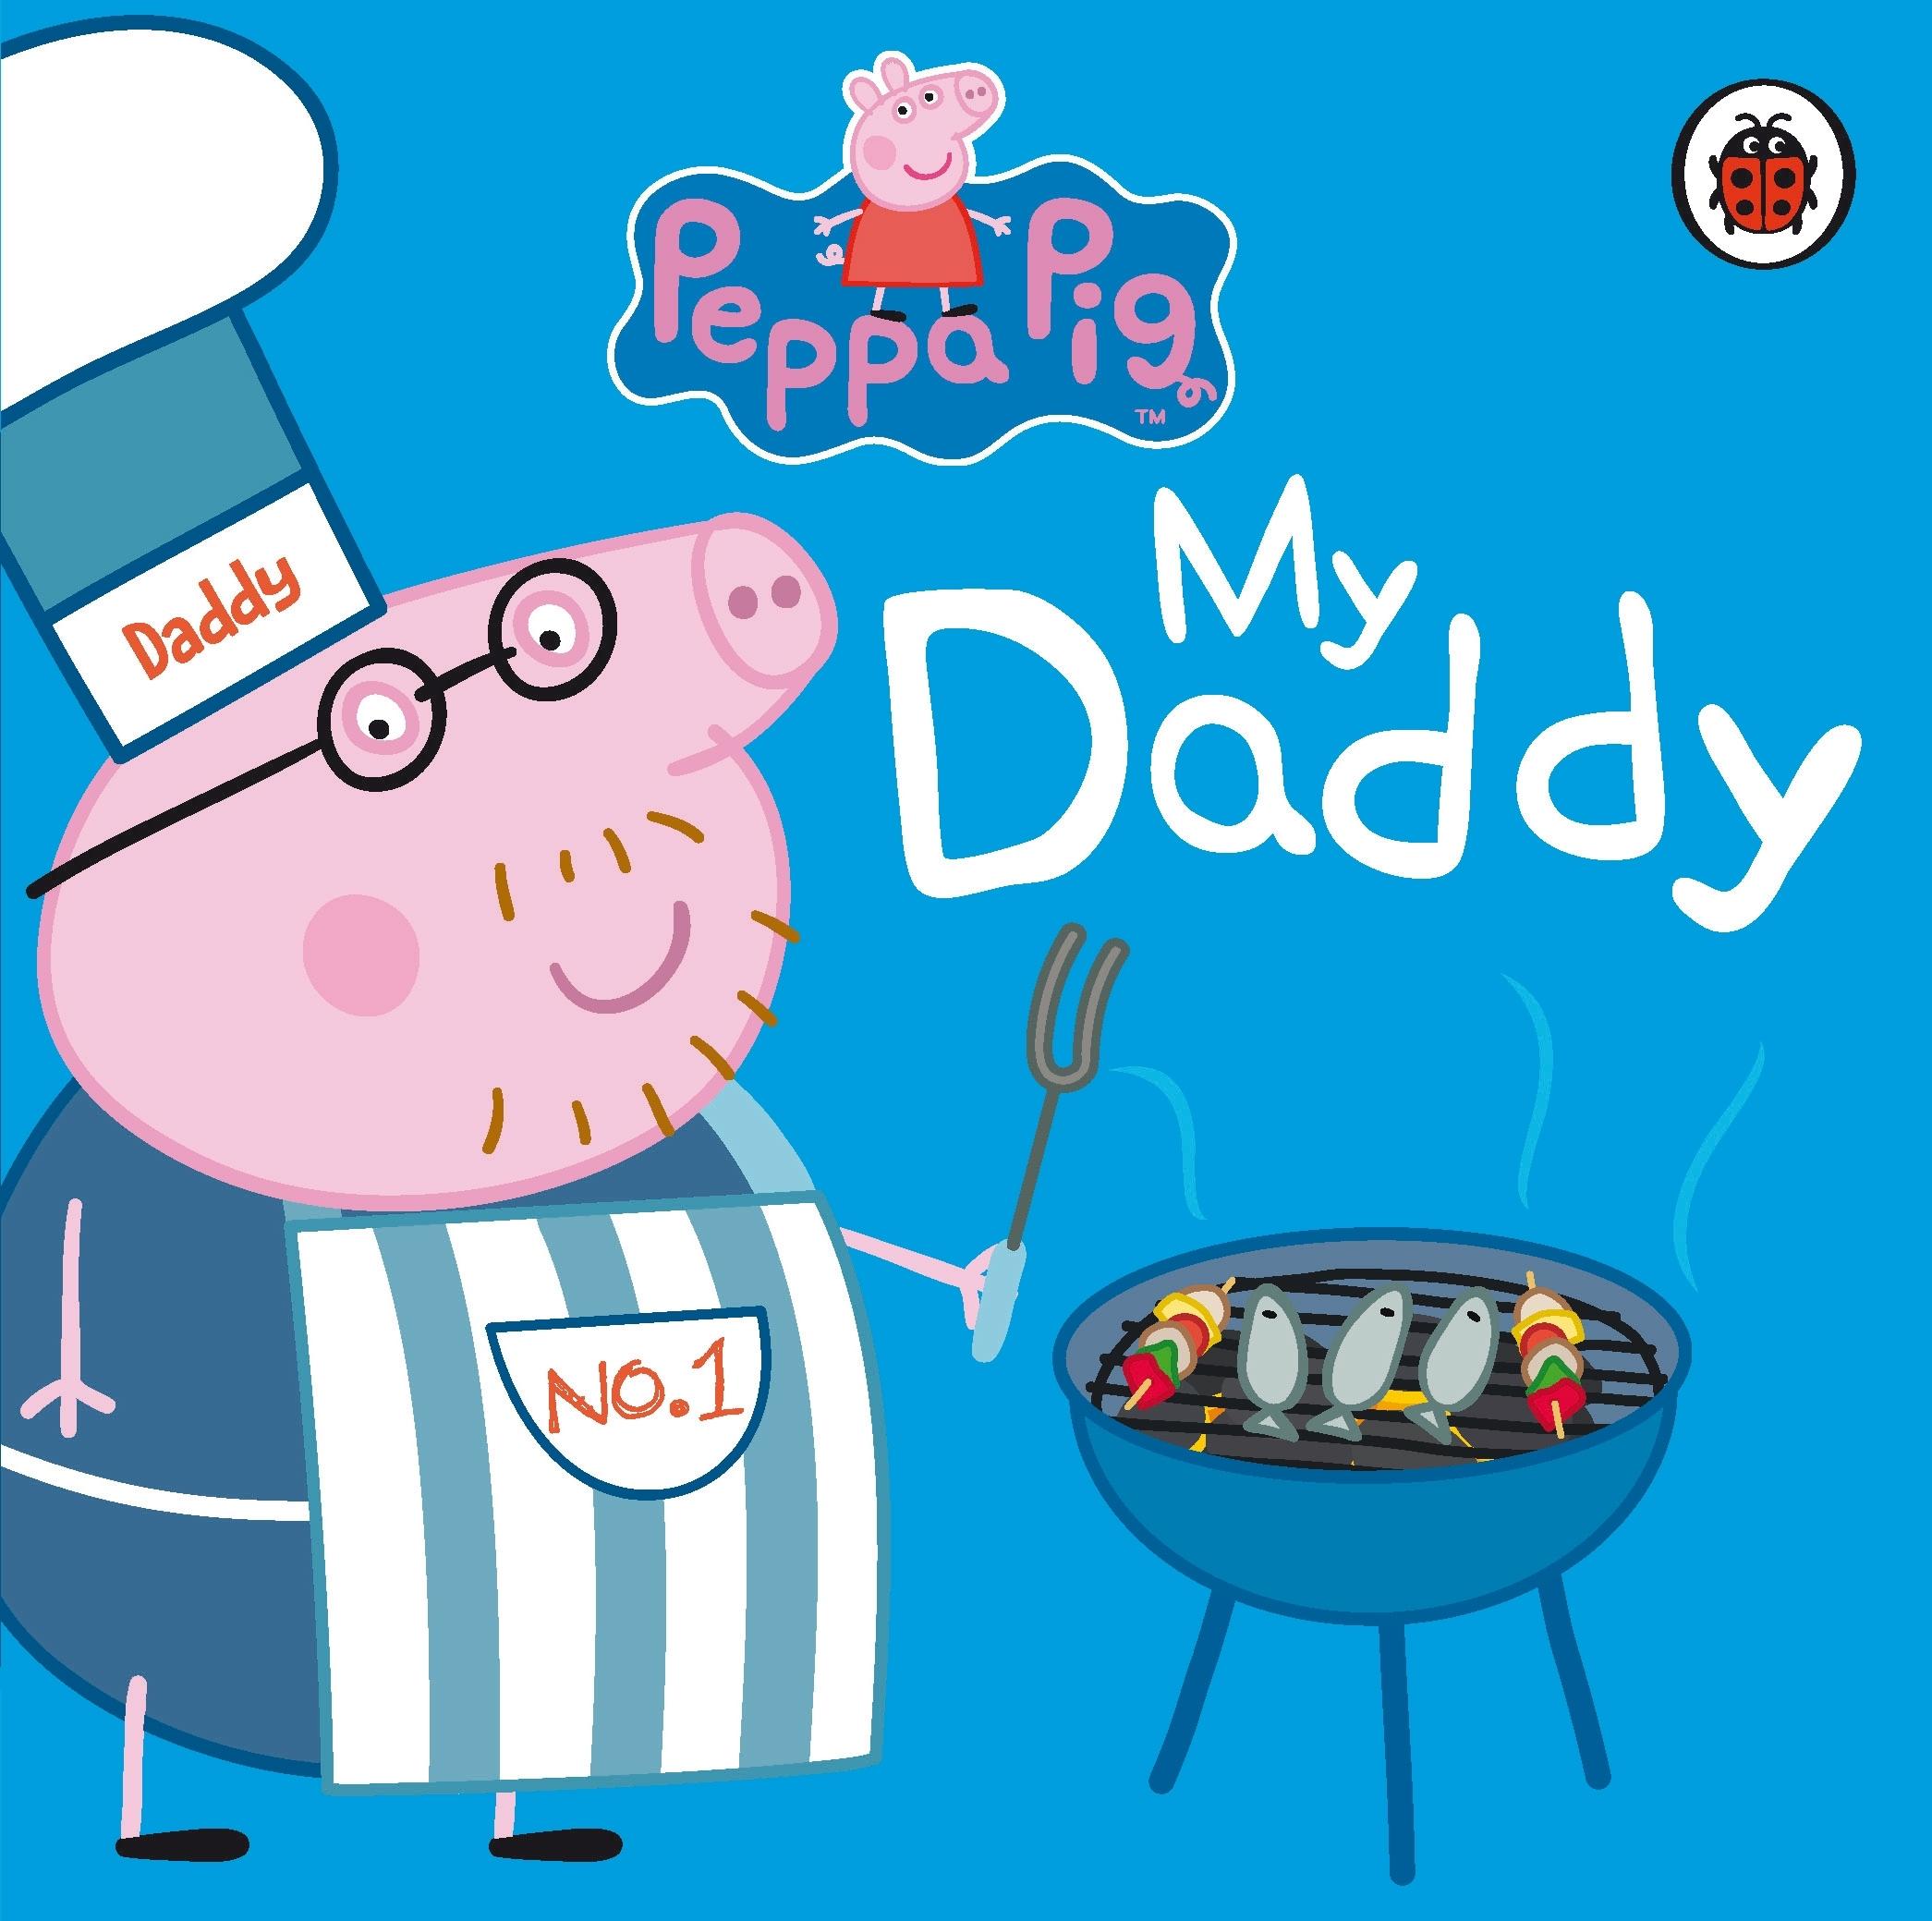 Peppa Pig My Daddy Penguin Books Australia